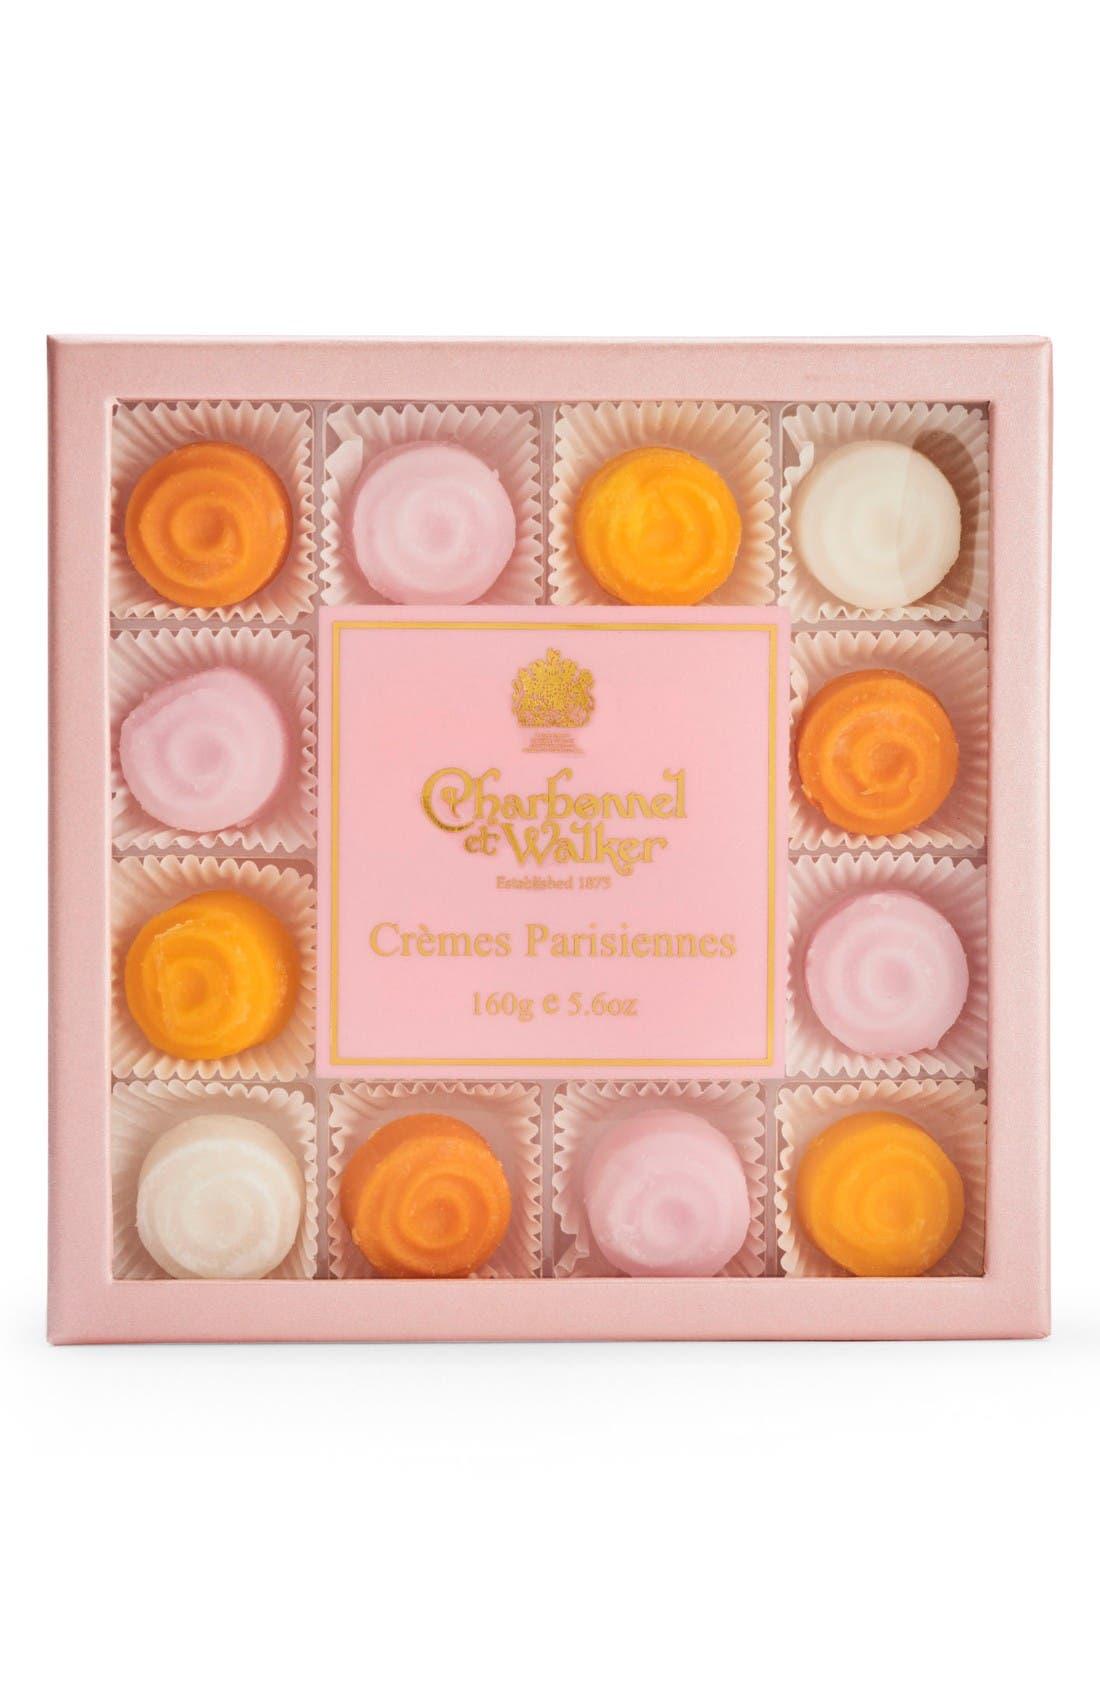 Alternate Image 1 Selected - Charbonnel et Walker Cremes Parisiennes in Gift Box